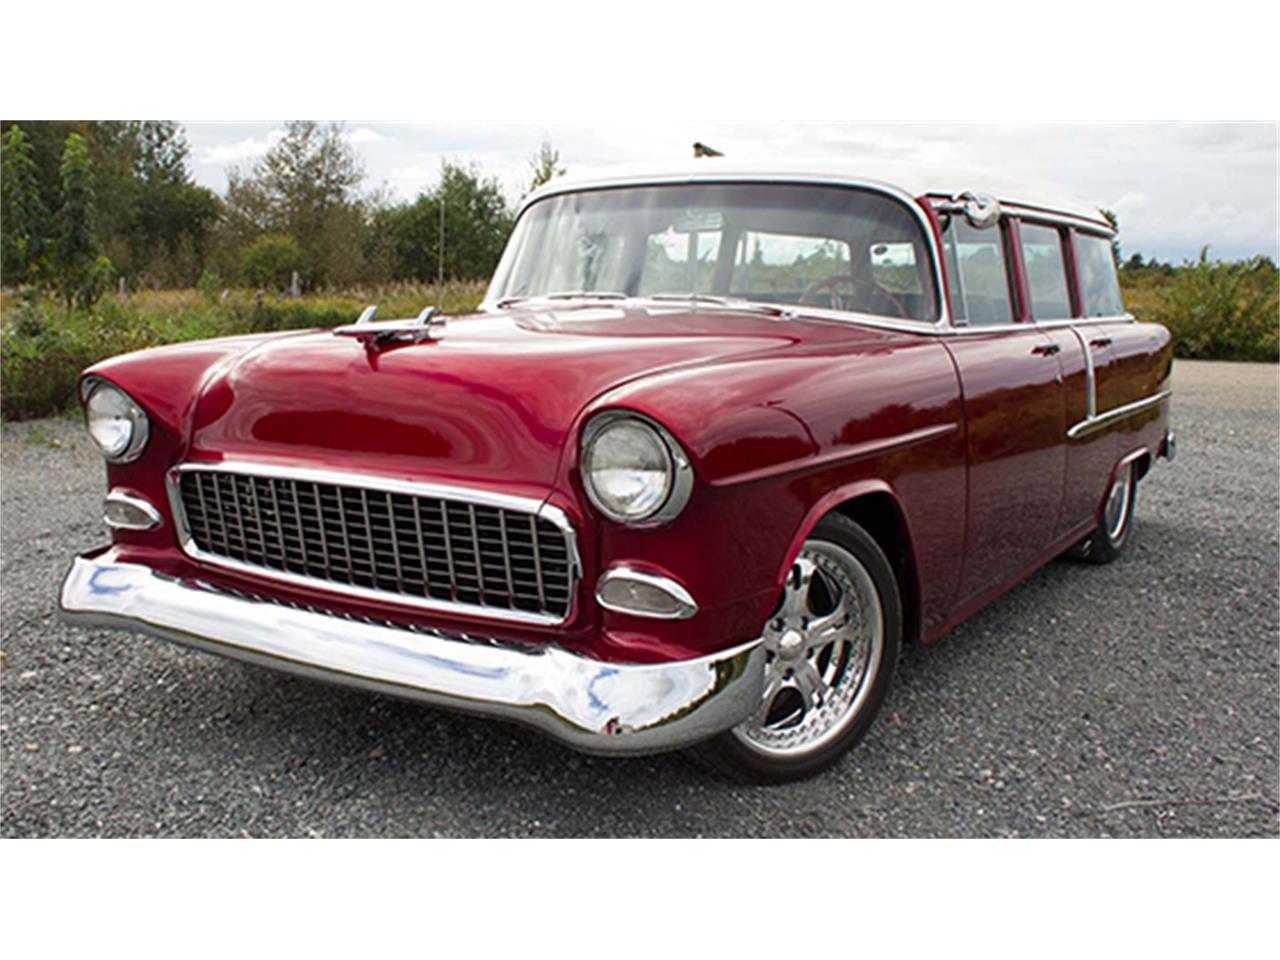 1955 chevrolet 210 four door restomod wagon for sale cc 968464. Black Bedroom Furniture Sets. Home Design Ideas